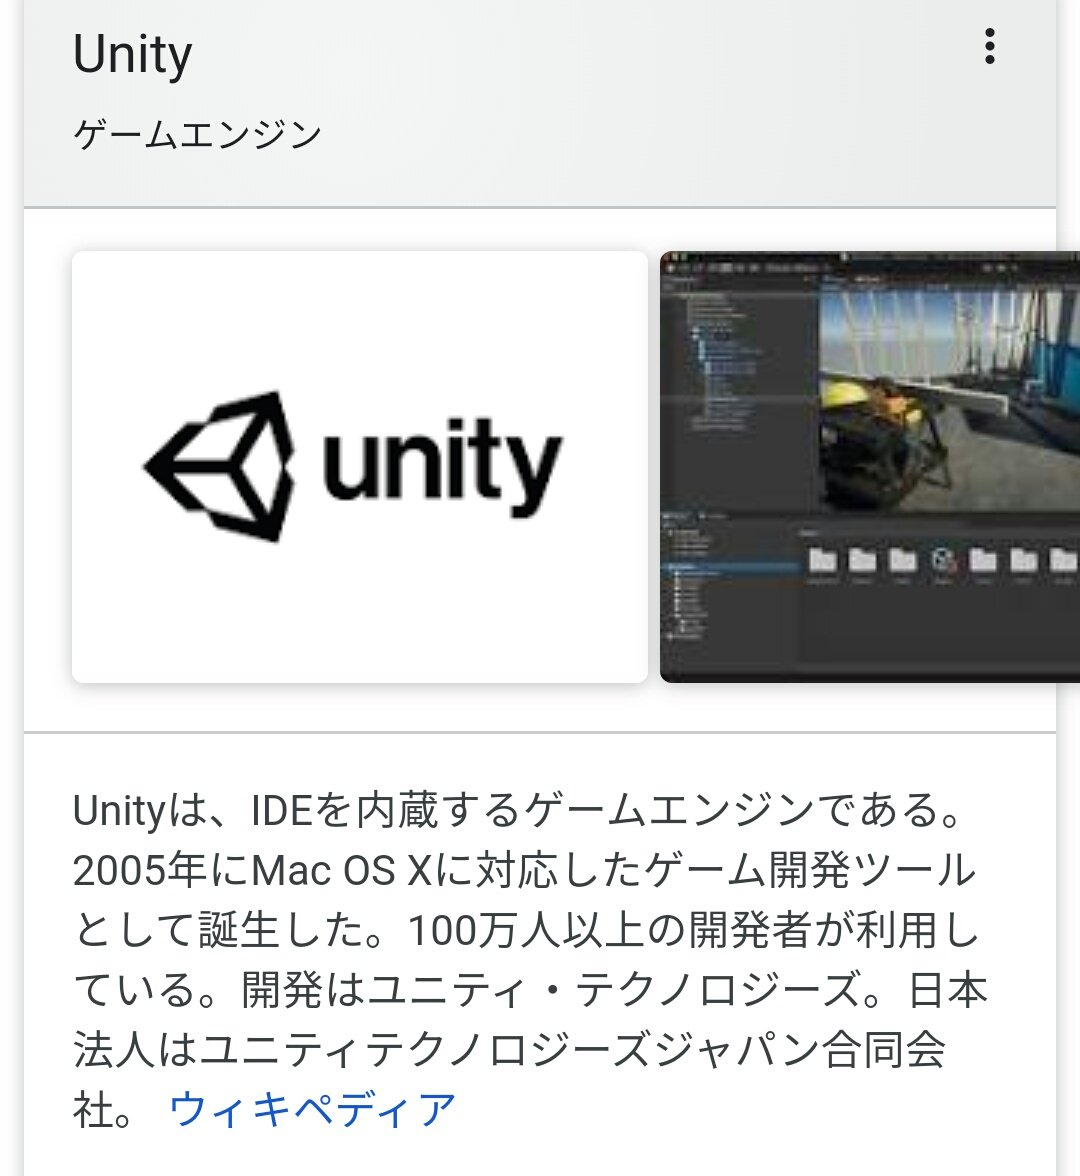 test ツイッターメディア - @Echi_usagi Unityオススメっすよ これ、ポケモンGOをゼロから丸々作れるらしいですマジで https://t.co/J0YjCJcnBV